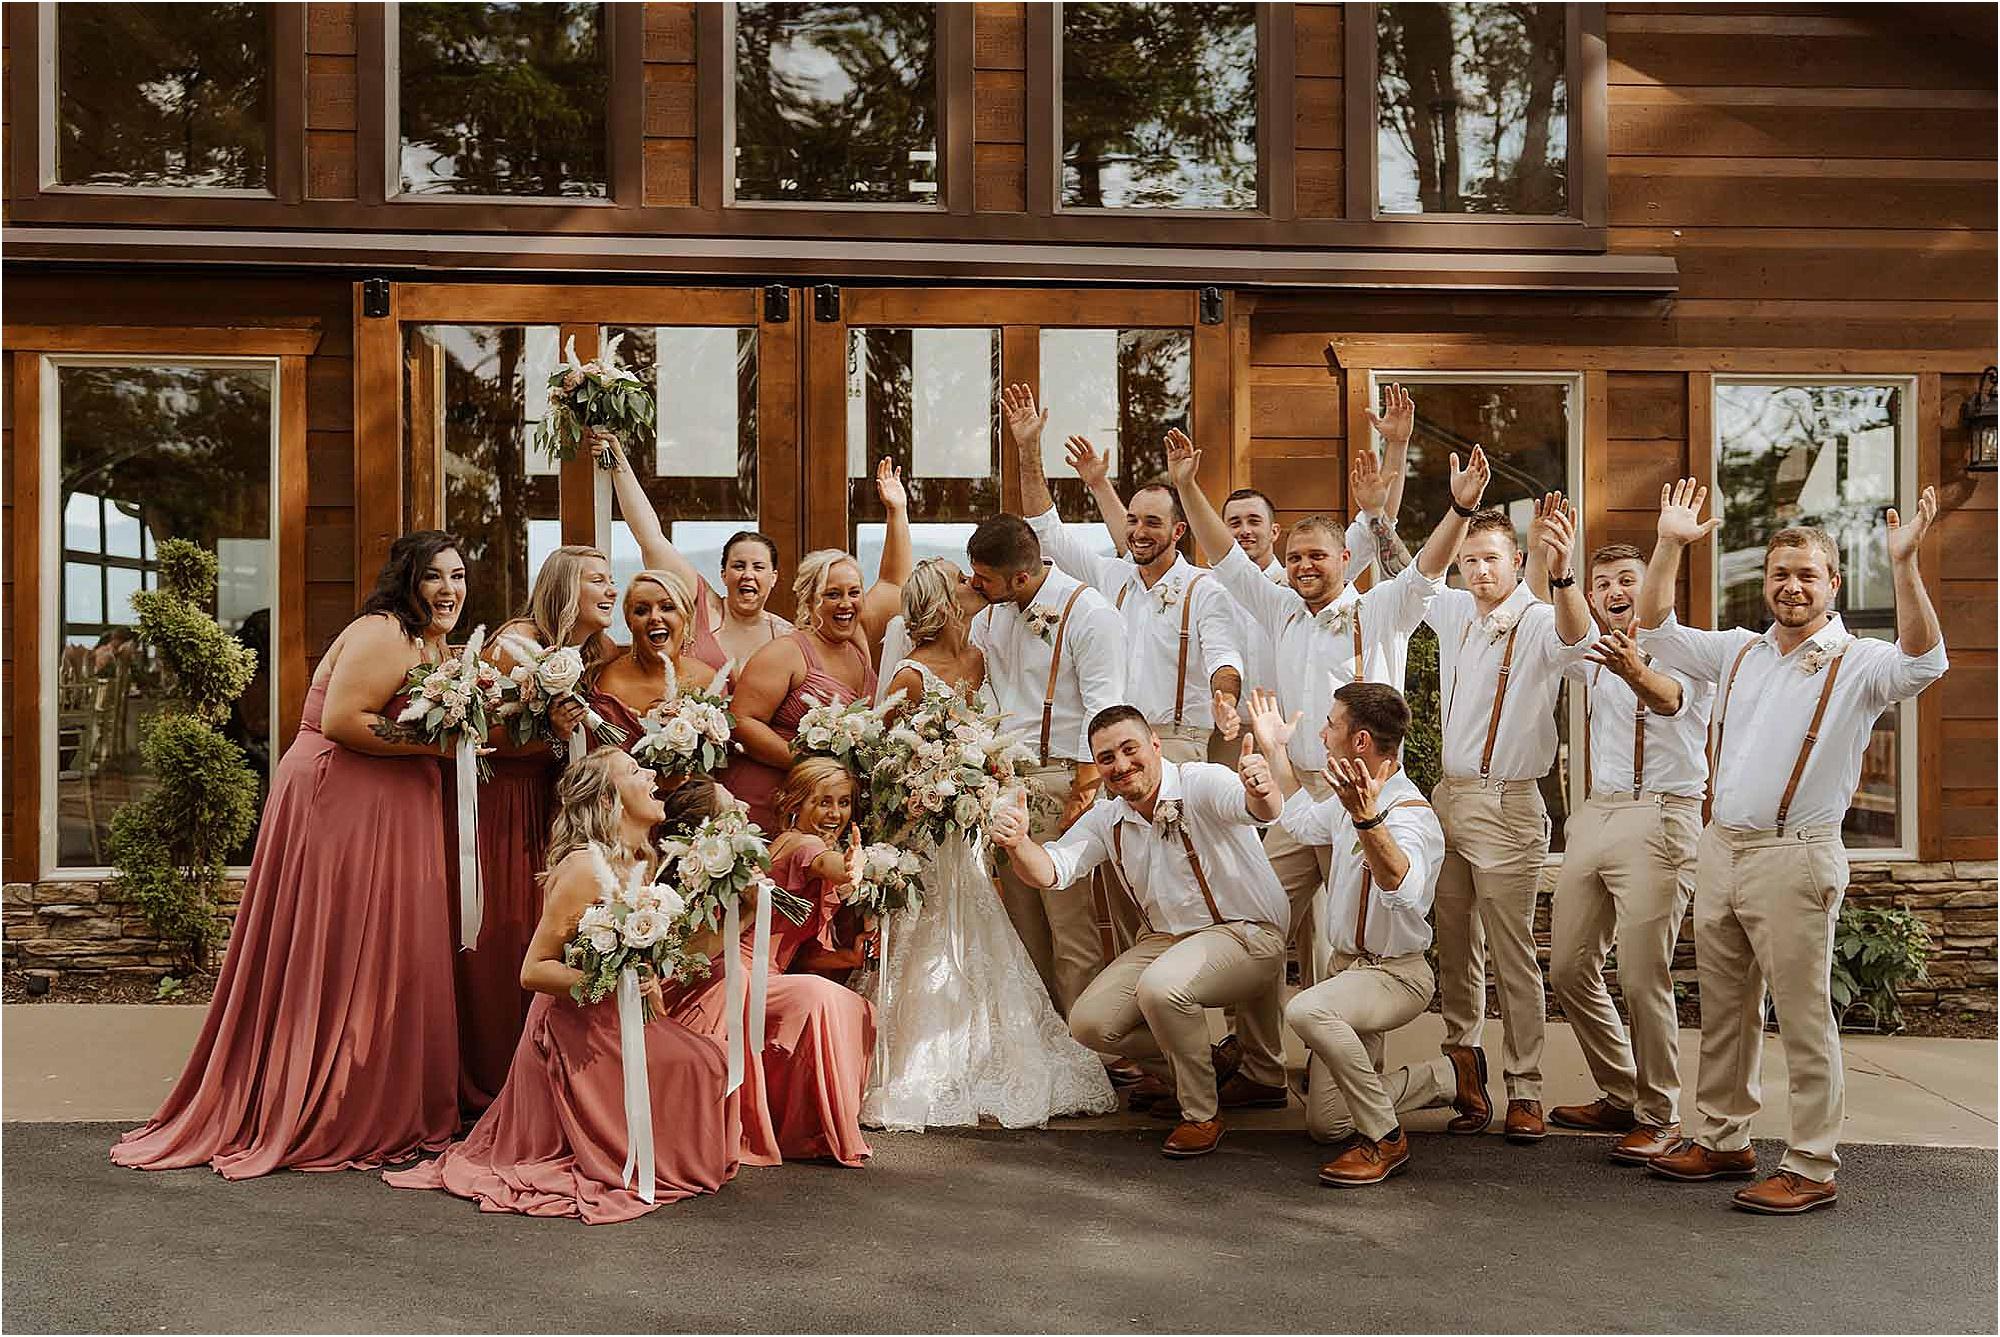 fun bridal party photos at summer wedding